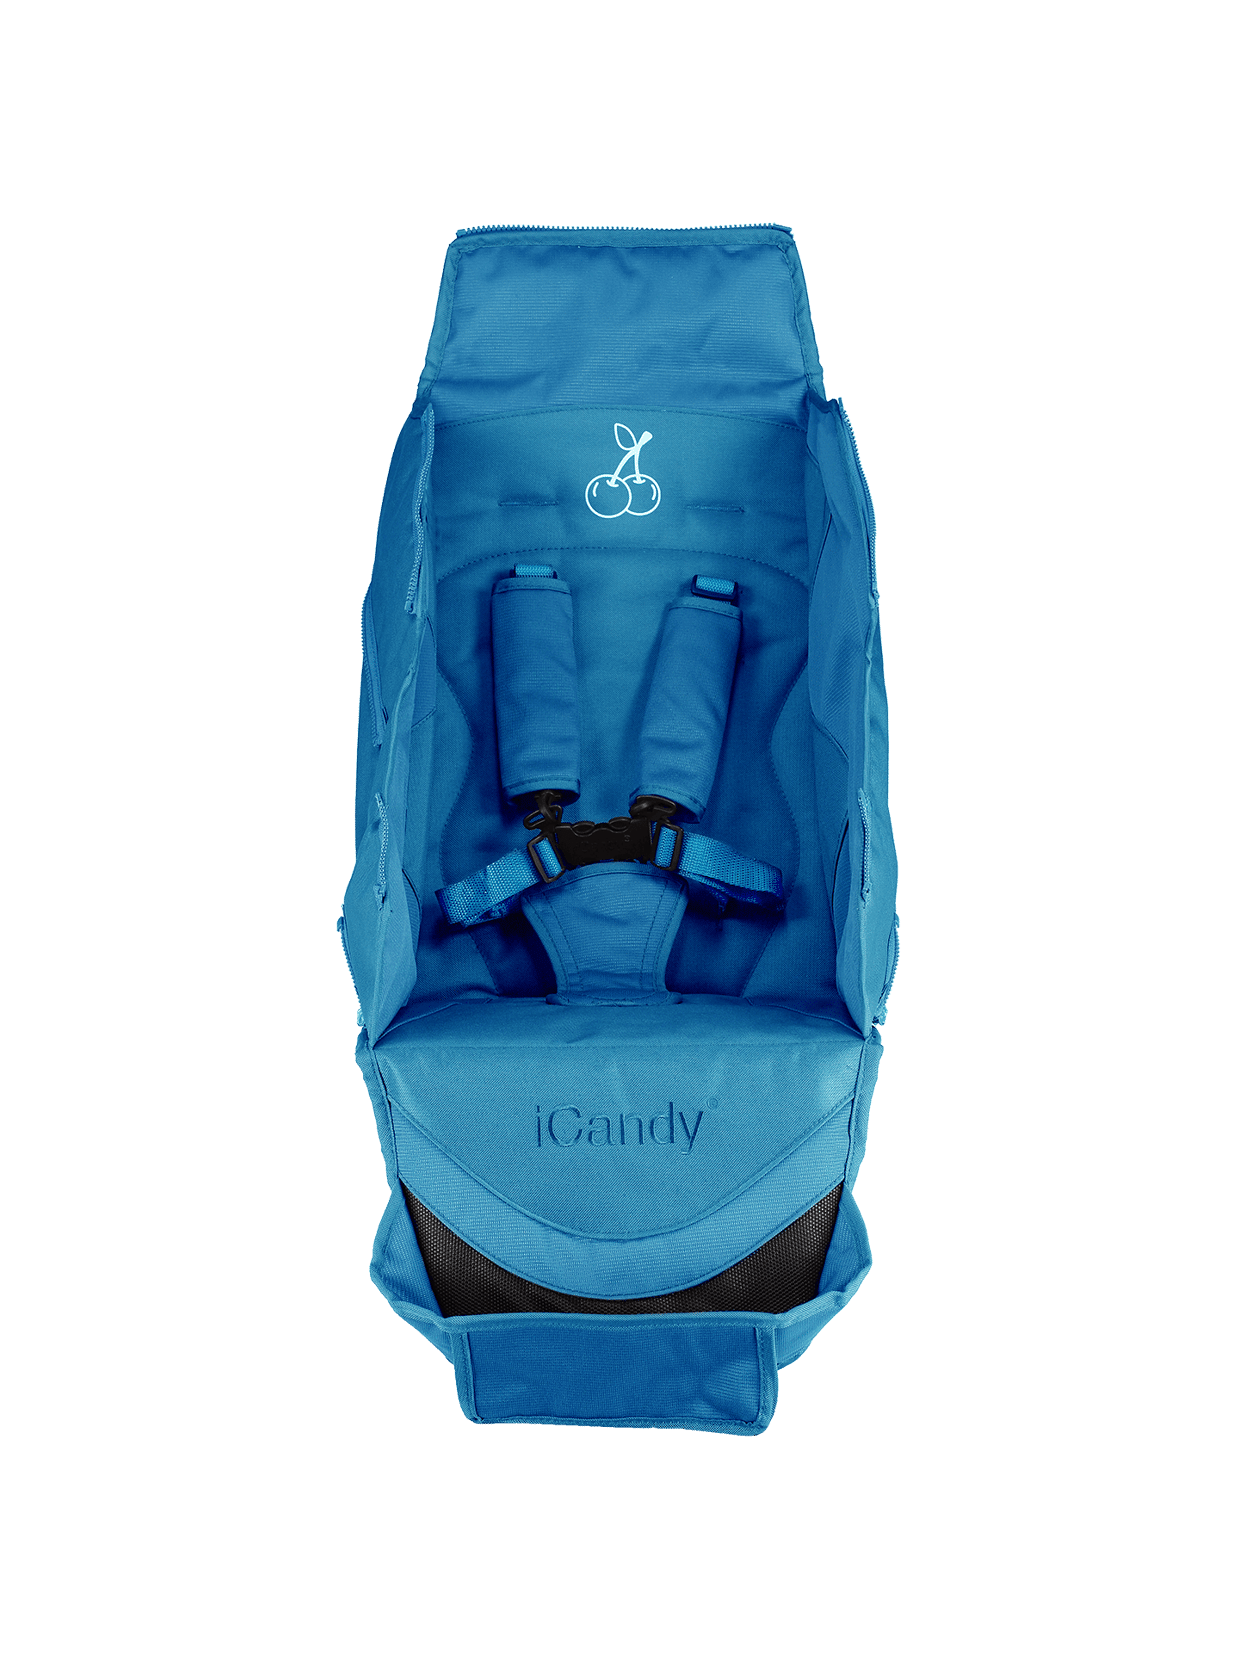 Cherry Seat Unit Fabric